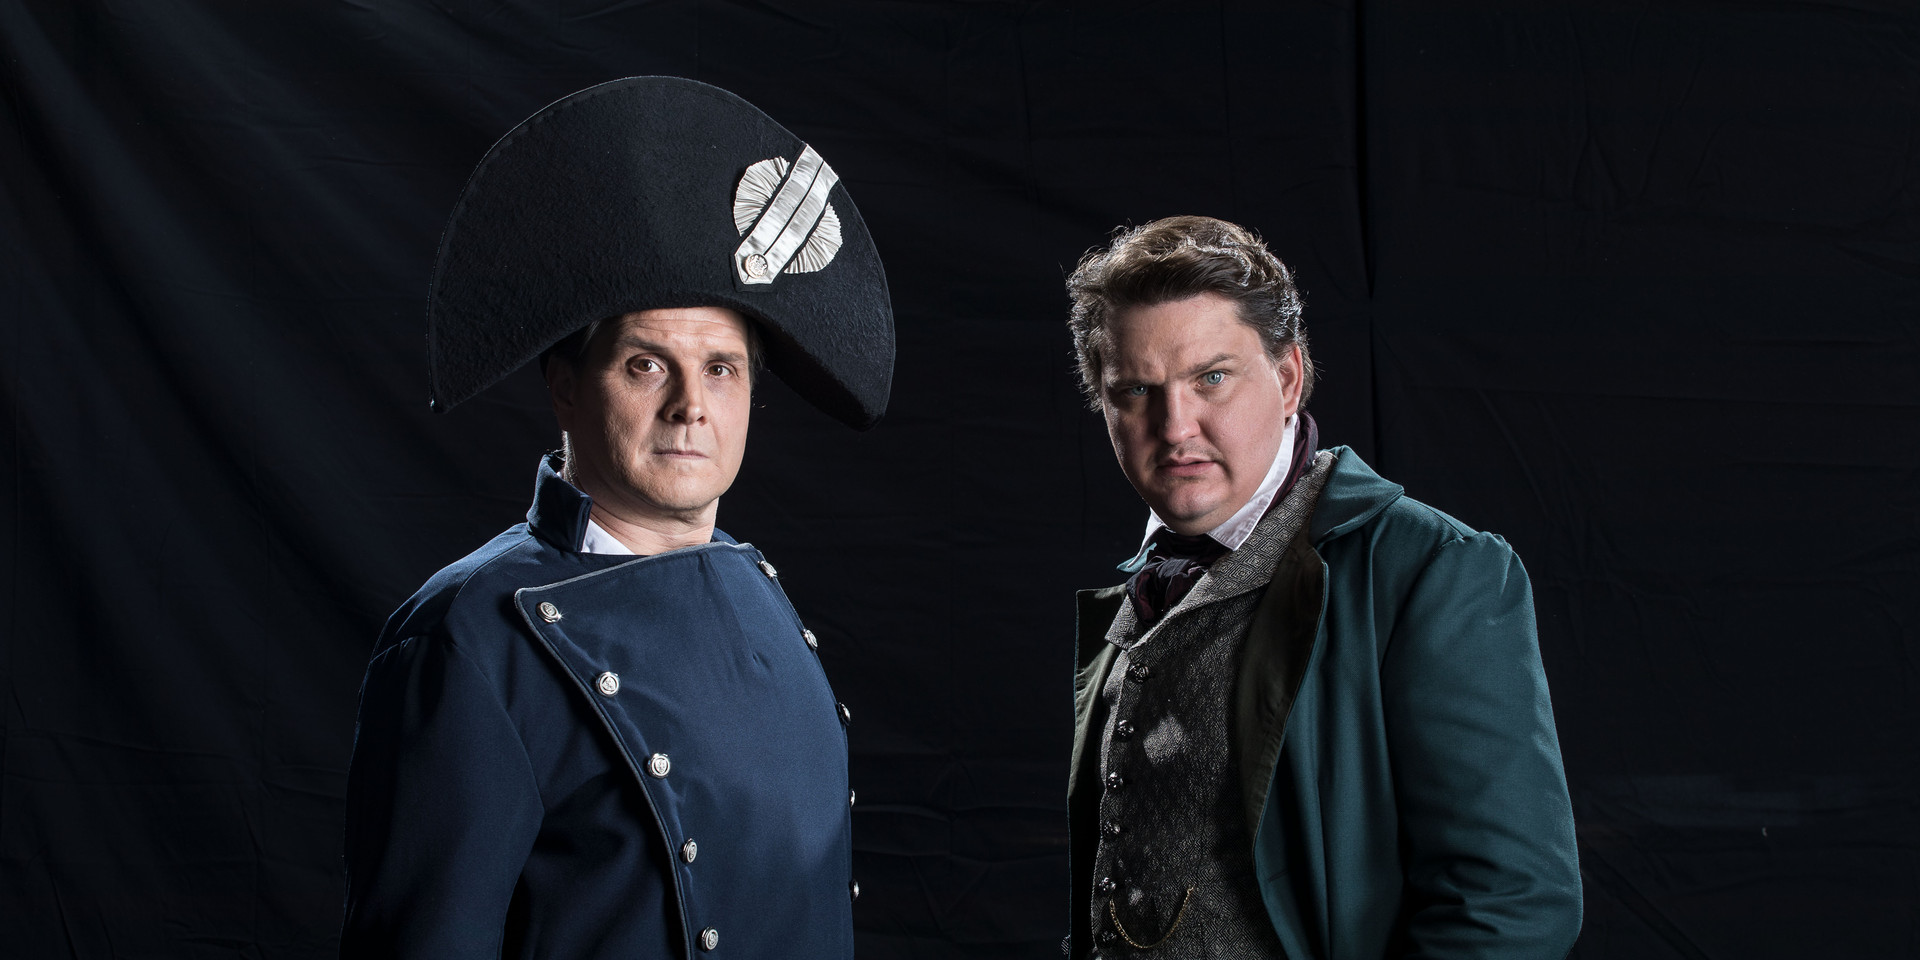 Inspector Javert and Jean Valjean